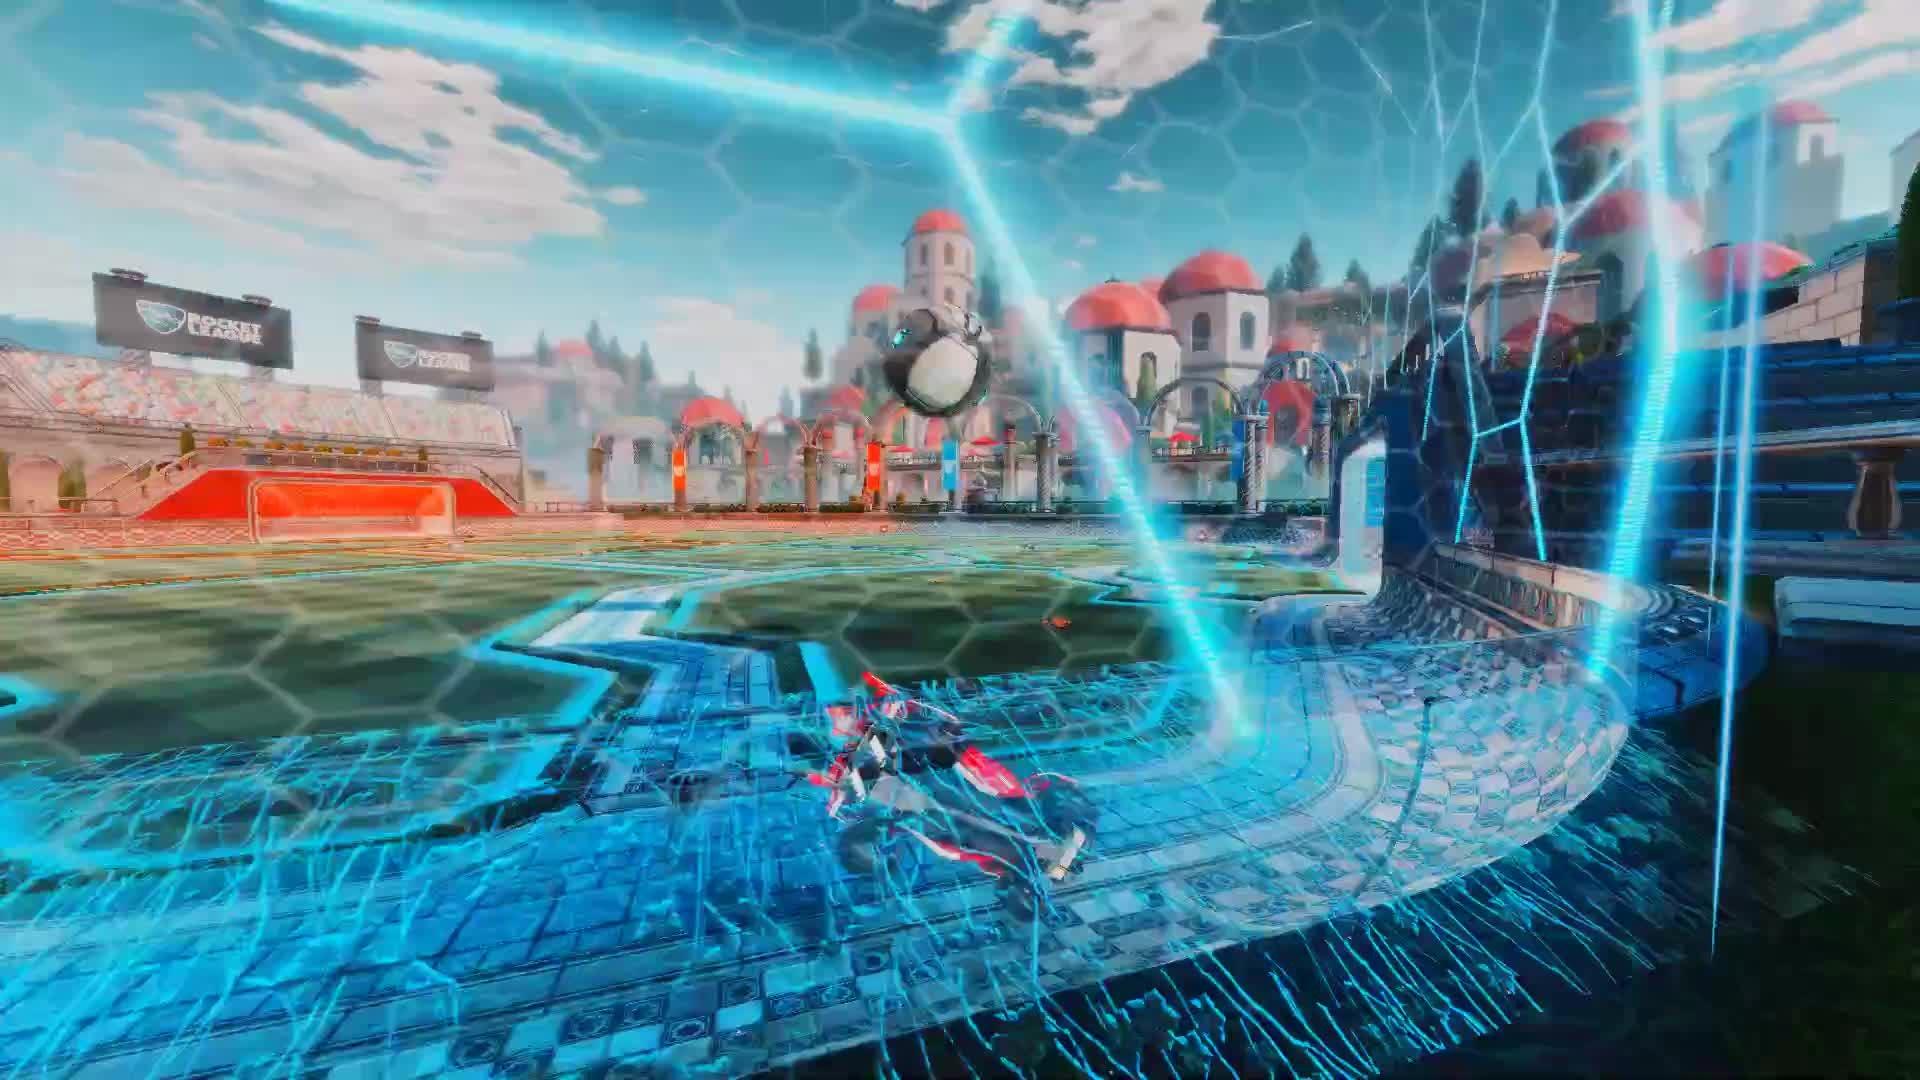 Rocket League: General - A nohter doupel touch 👍😉 video cover image 0